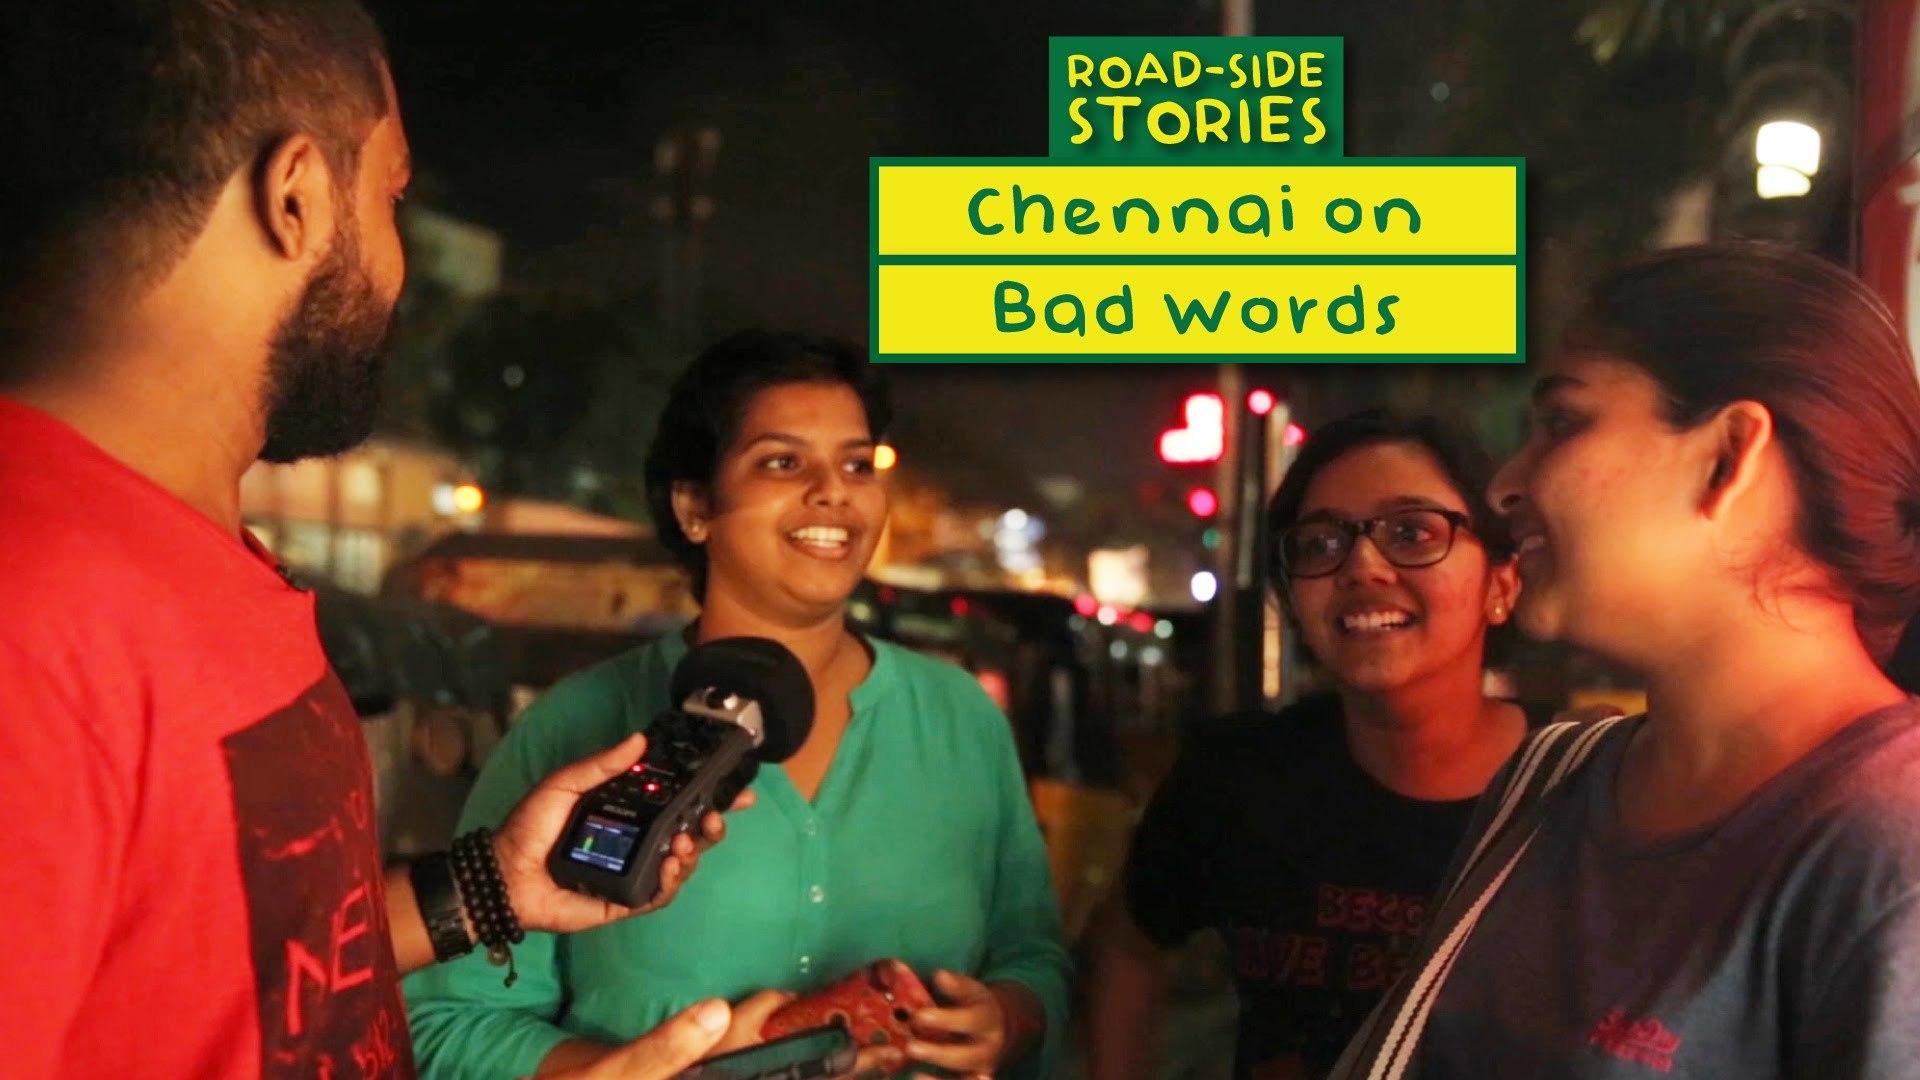 Chennai on Bad Words - Road Side Stories | Put Chutney